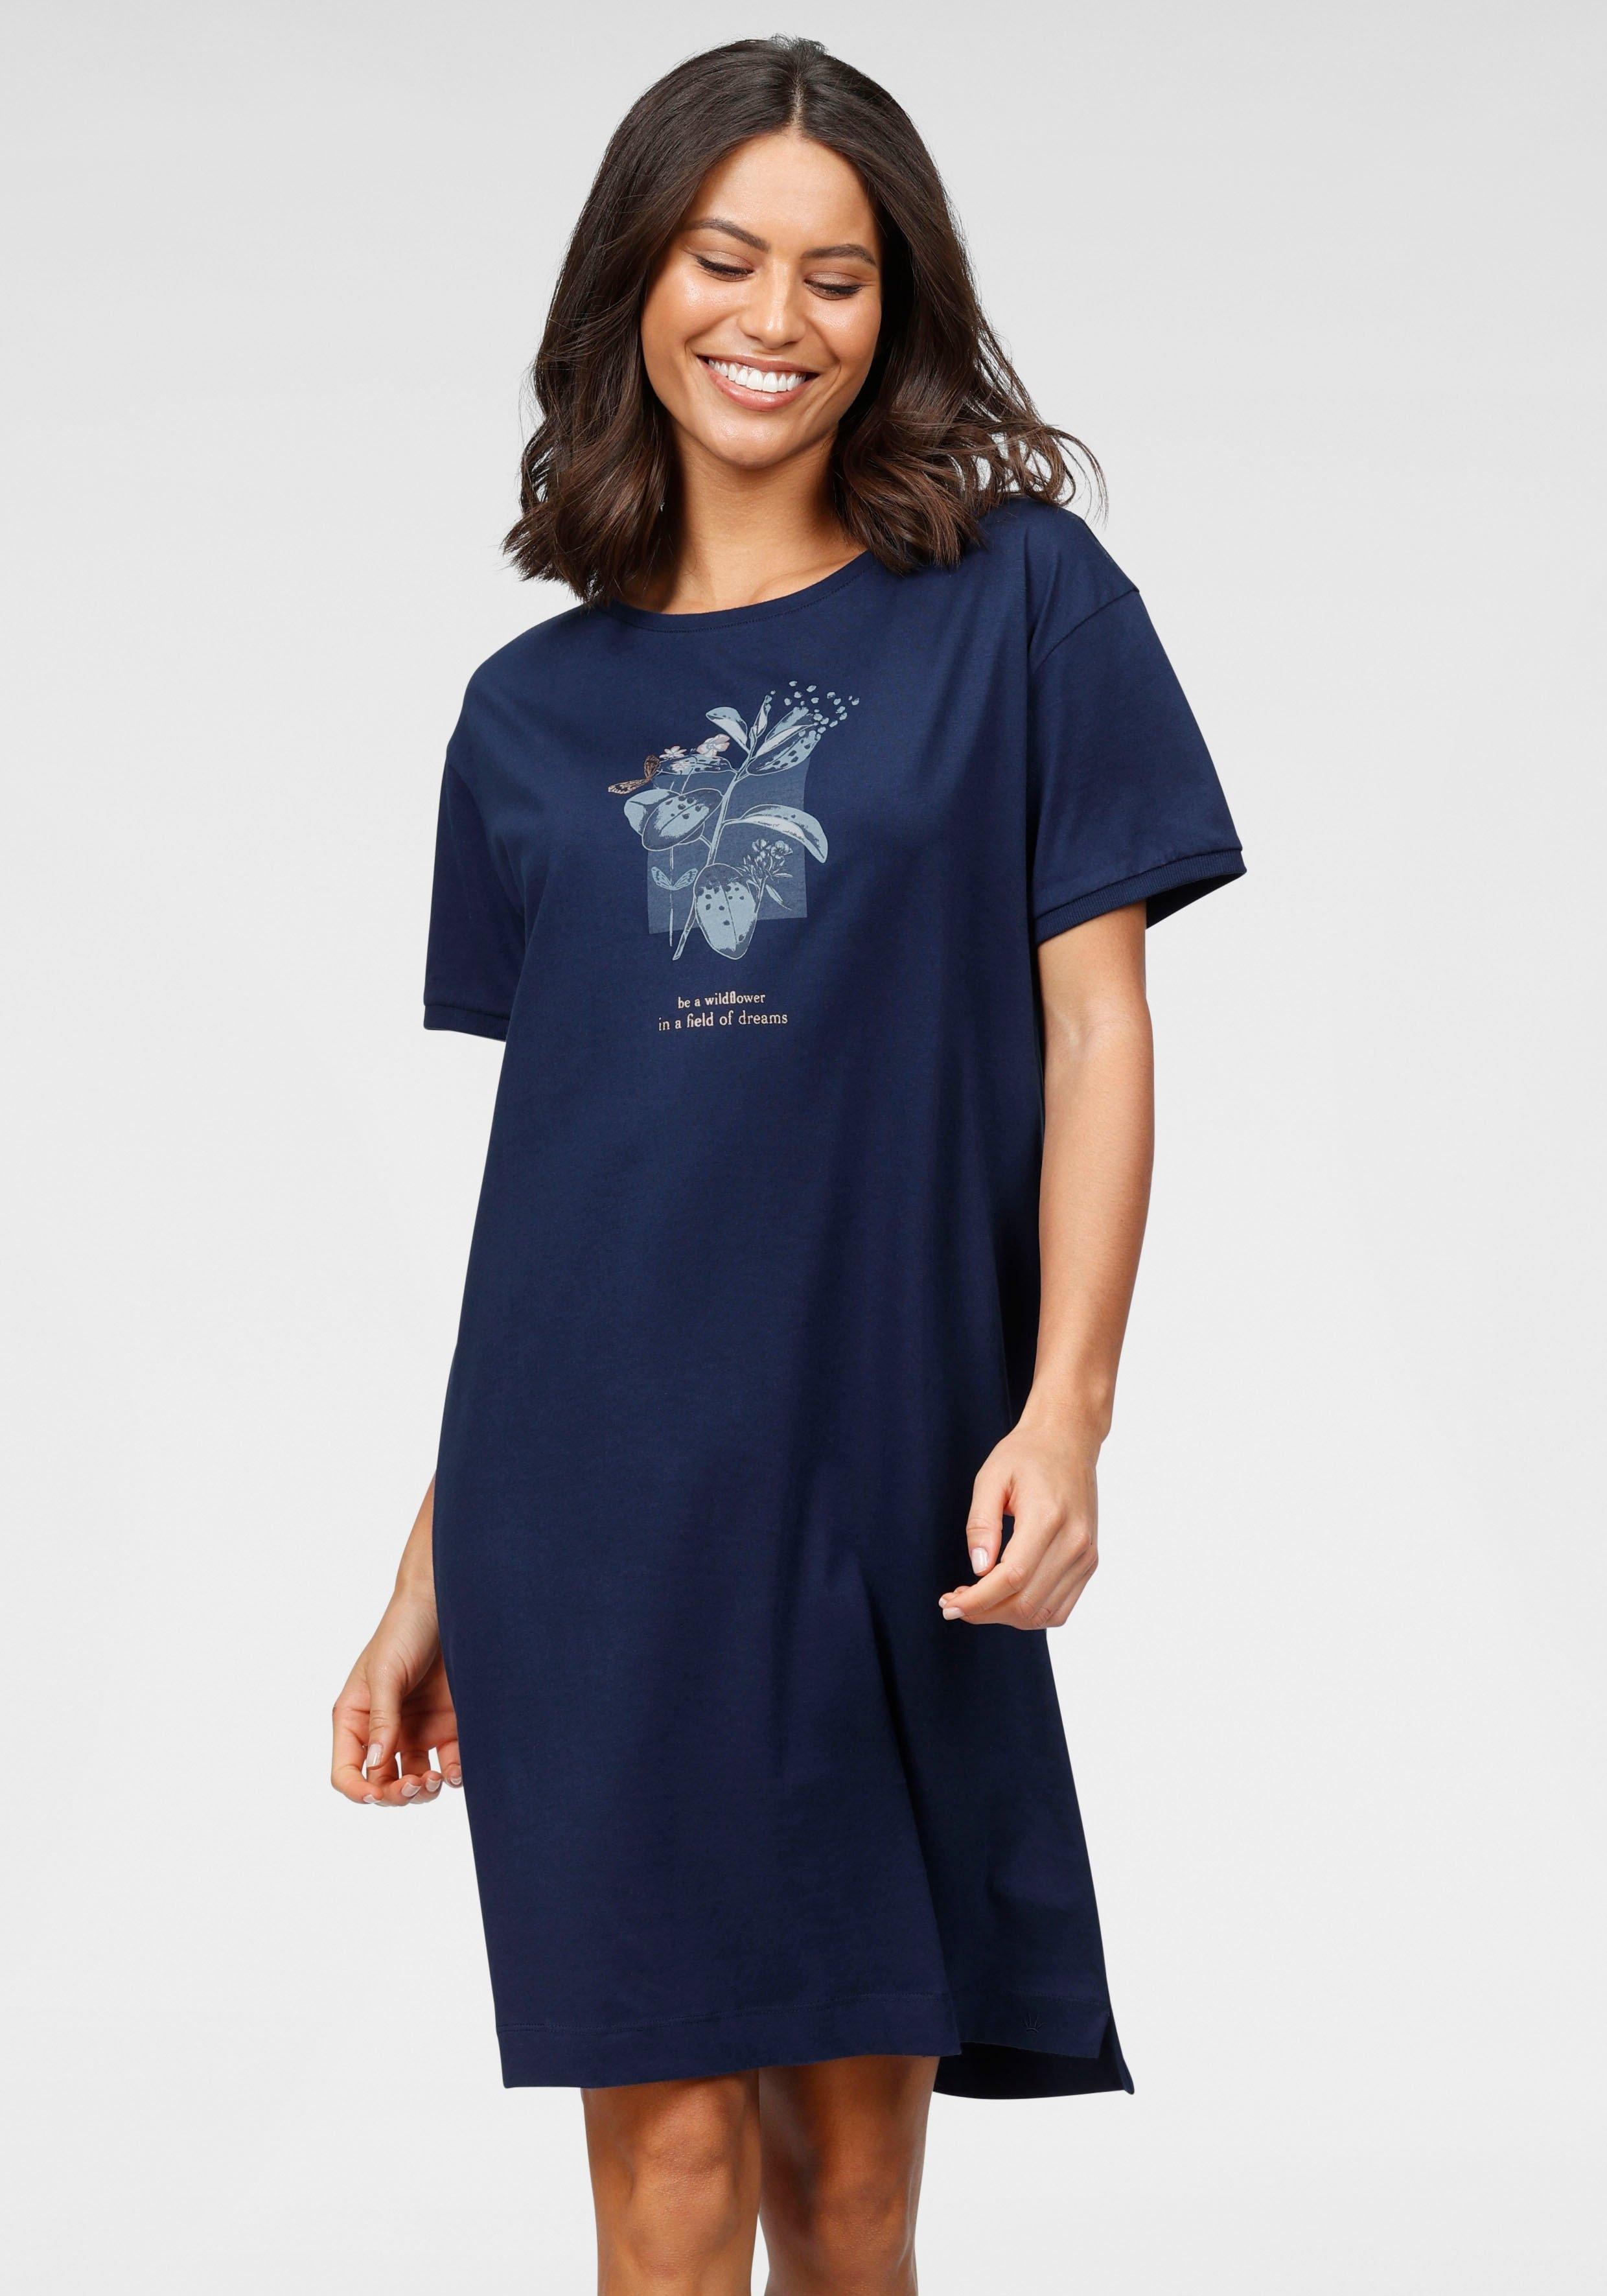 Triumph nachthemd met gebloemde frontprint - gratis ruilen op lascana.nl